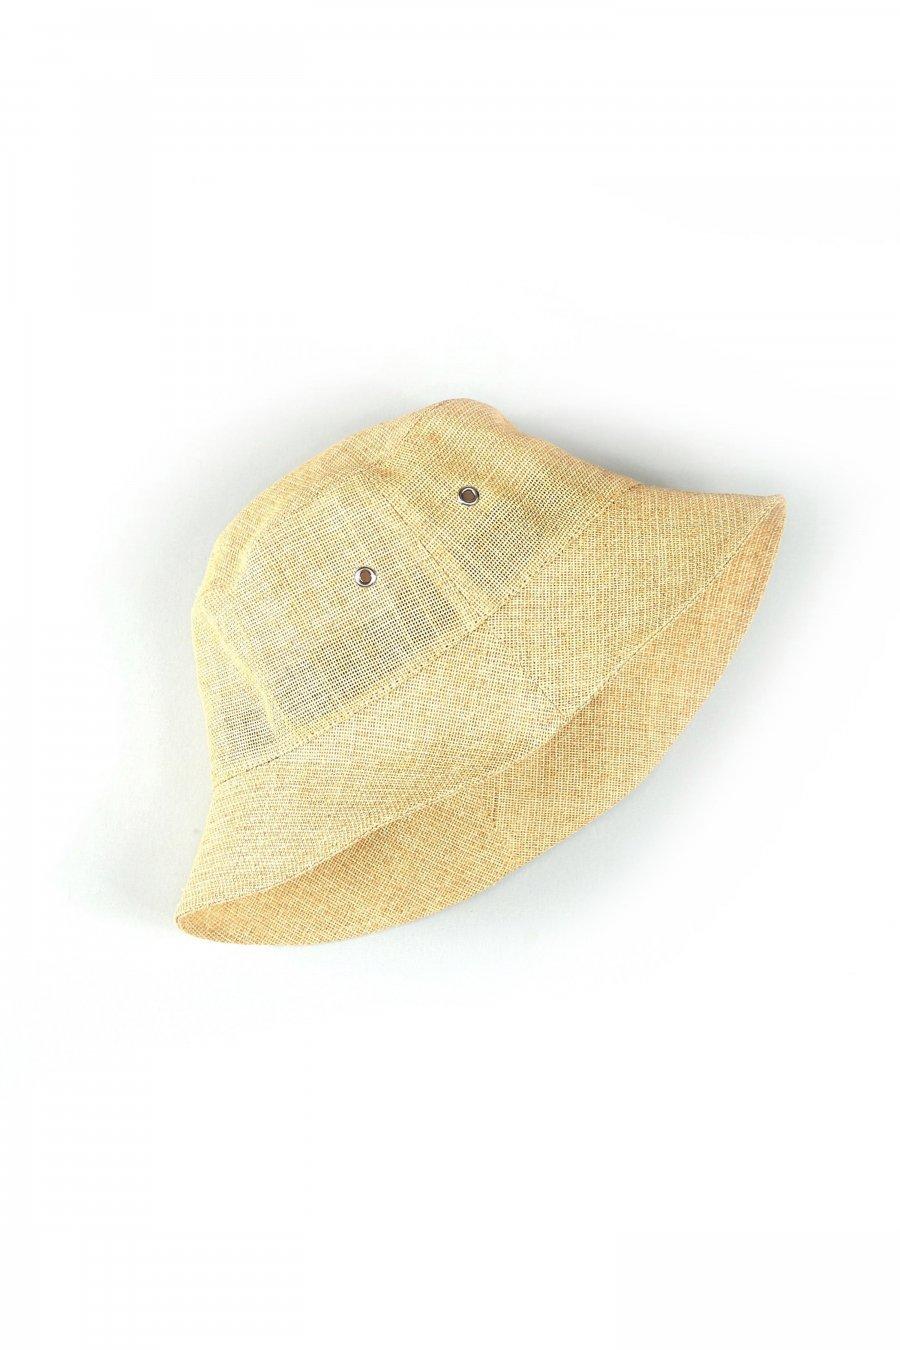 elephant TRIBAL fabrics  Resort Bucket hat(BEIGE)<img class='new_mark_img2' src='https://img.shop-pro.jp/img/new/icons15.gif' style='border:none;display:inline;margin:0px;padding:0px;width:auto;' />